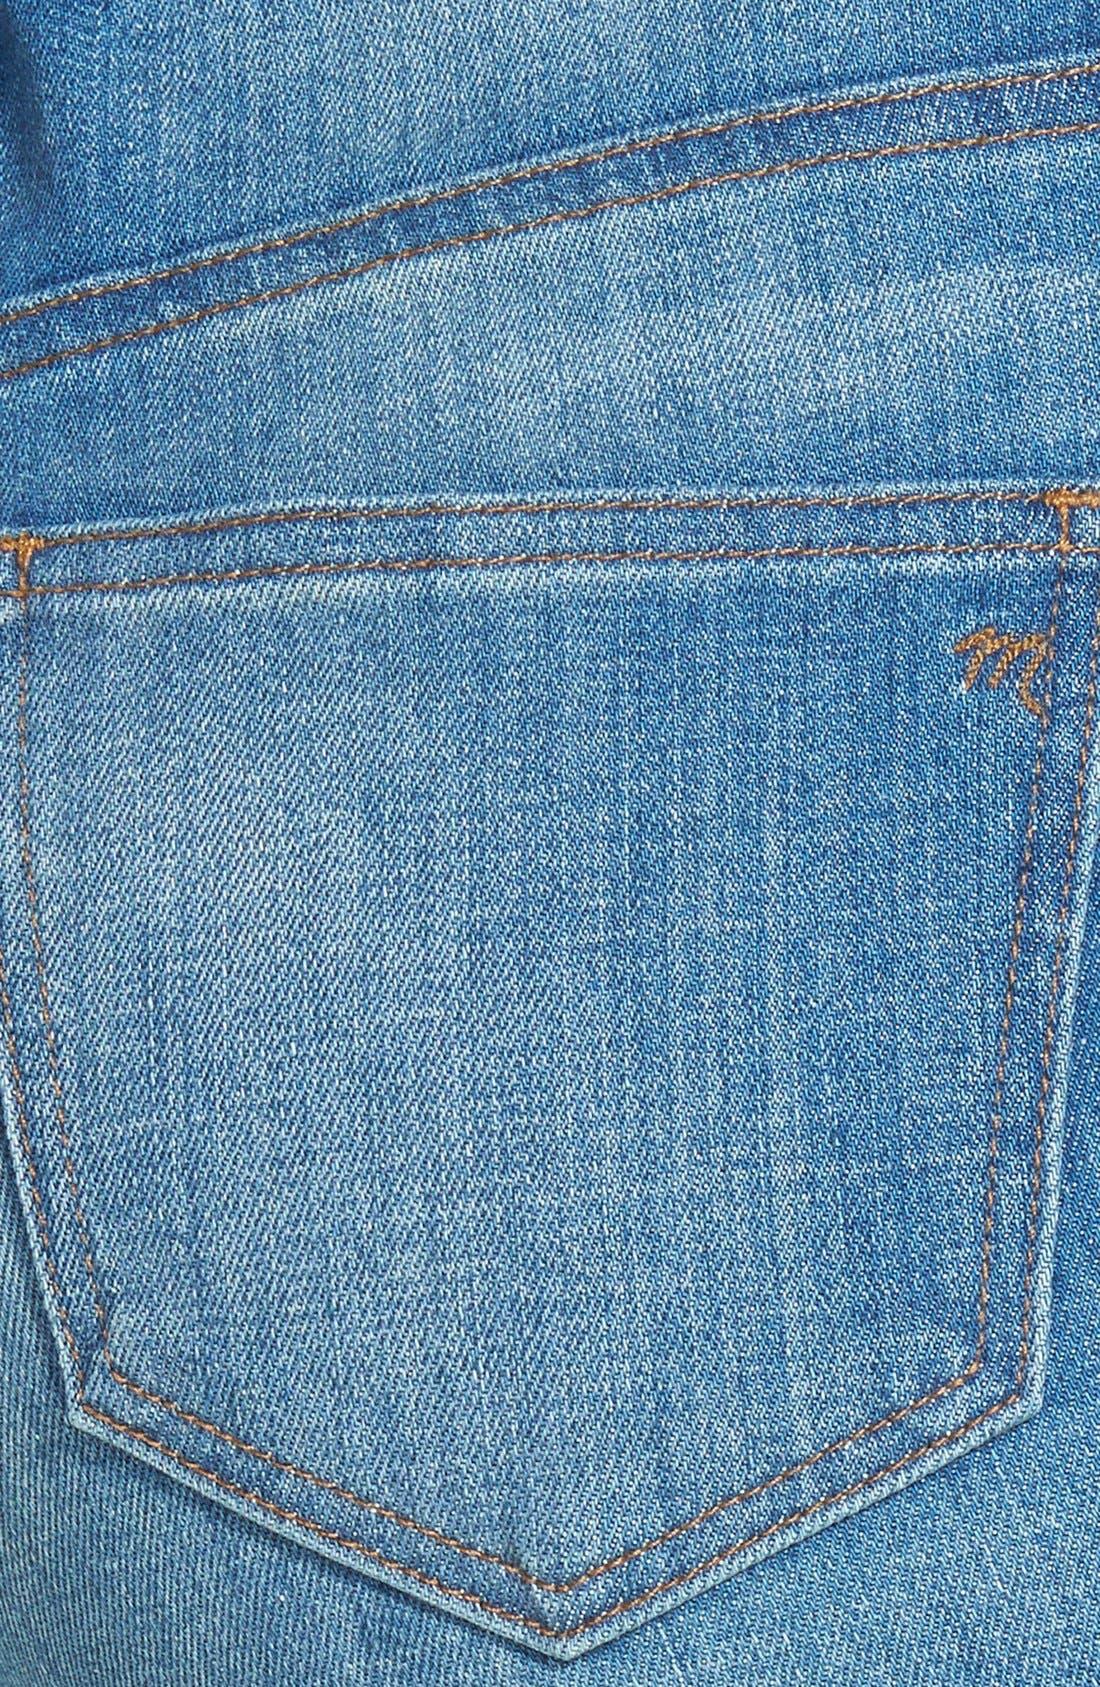 Alternate Image 3  - Madewell 'Flea Market Flare' High Rise Jeans (Thom)